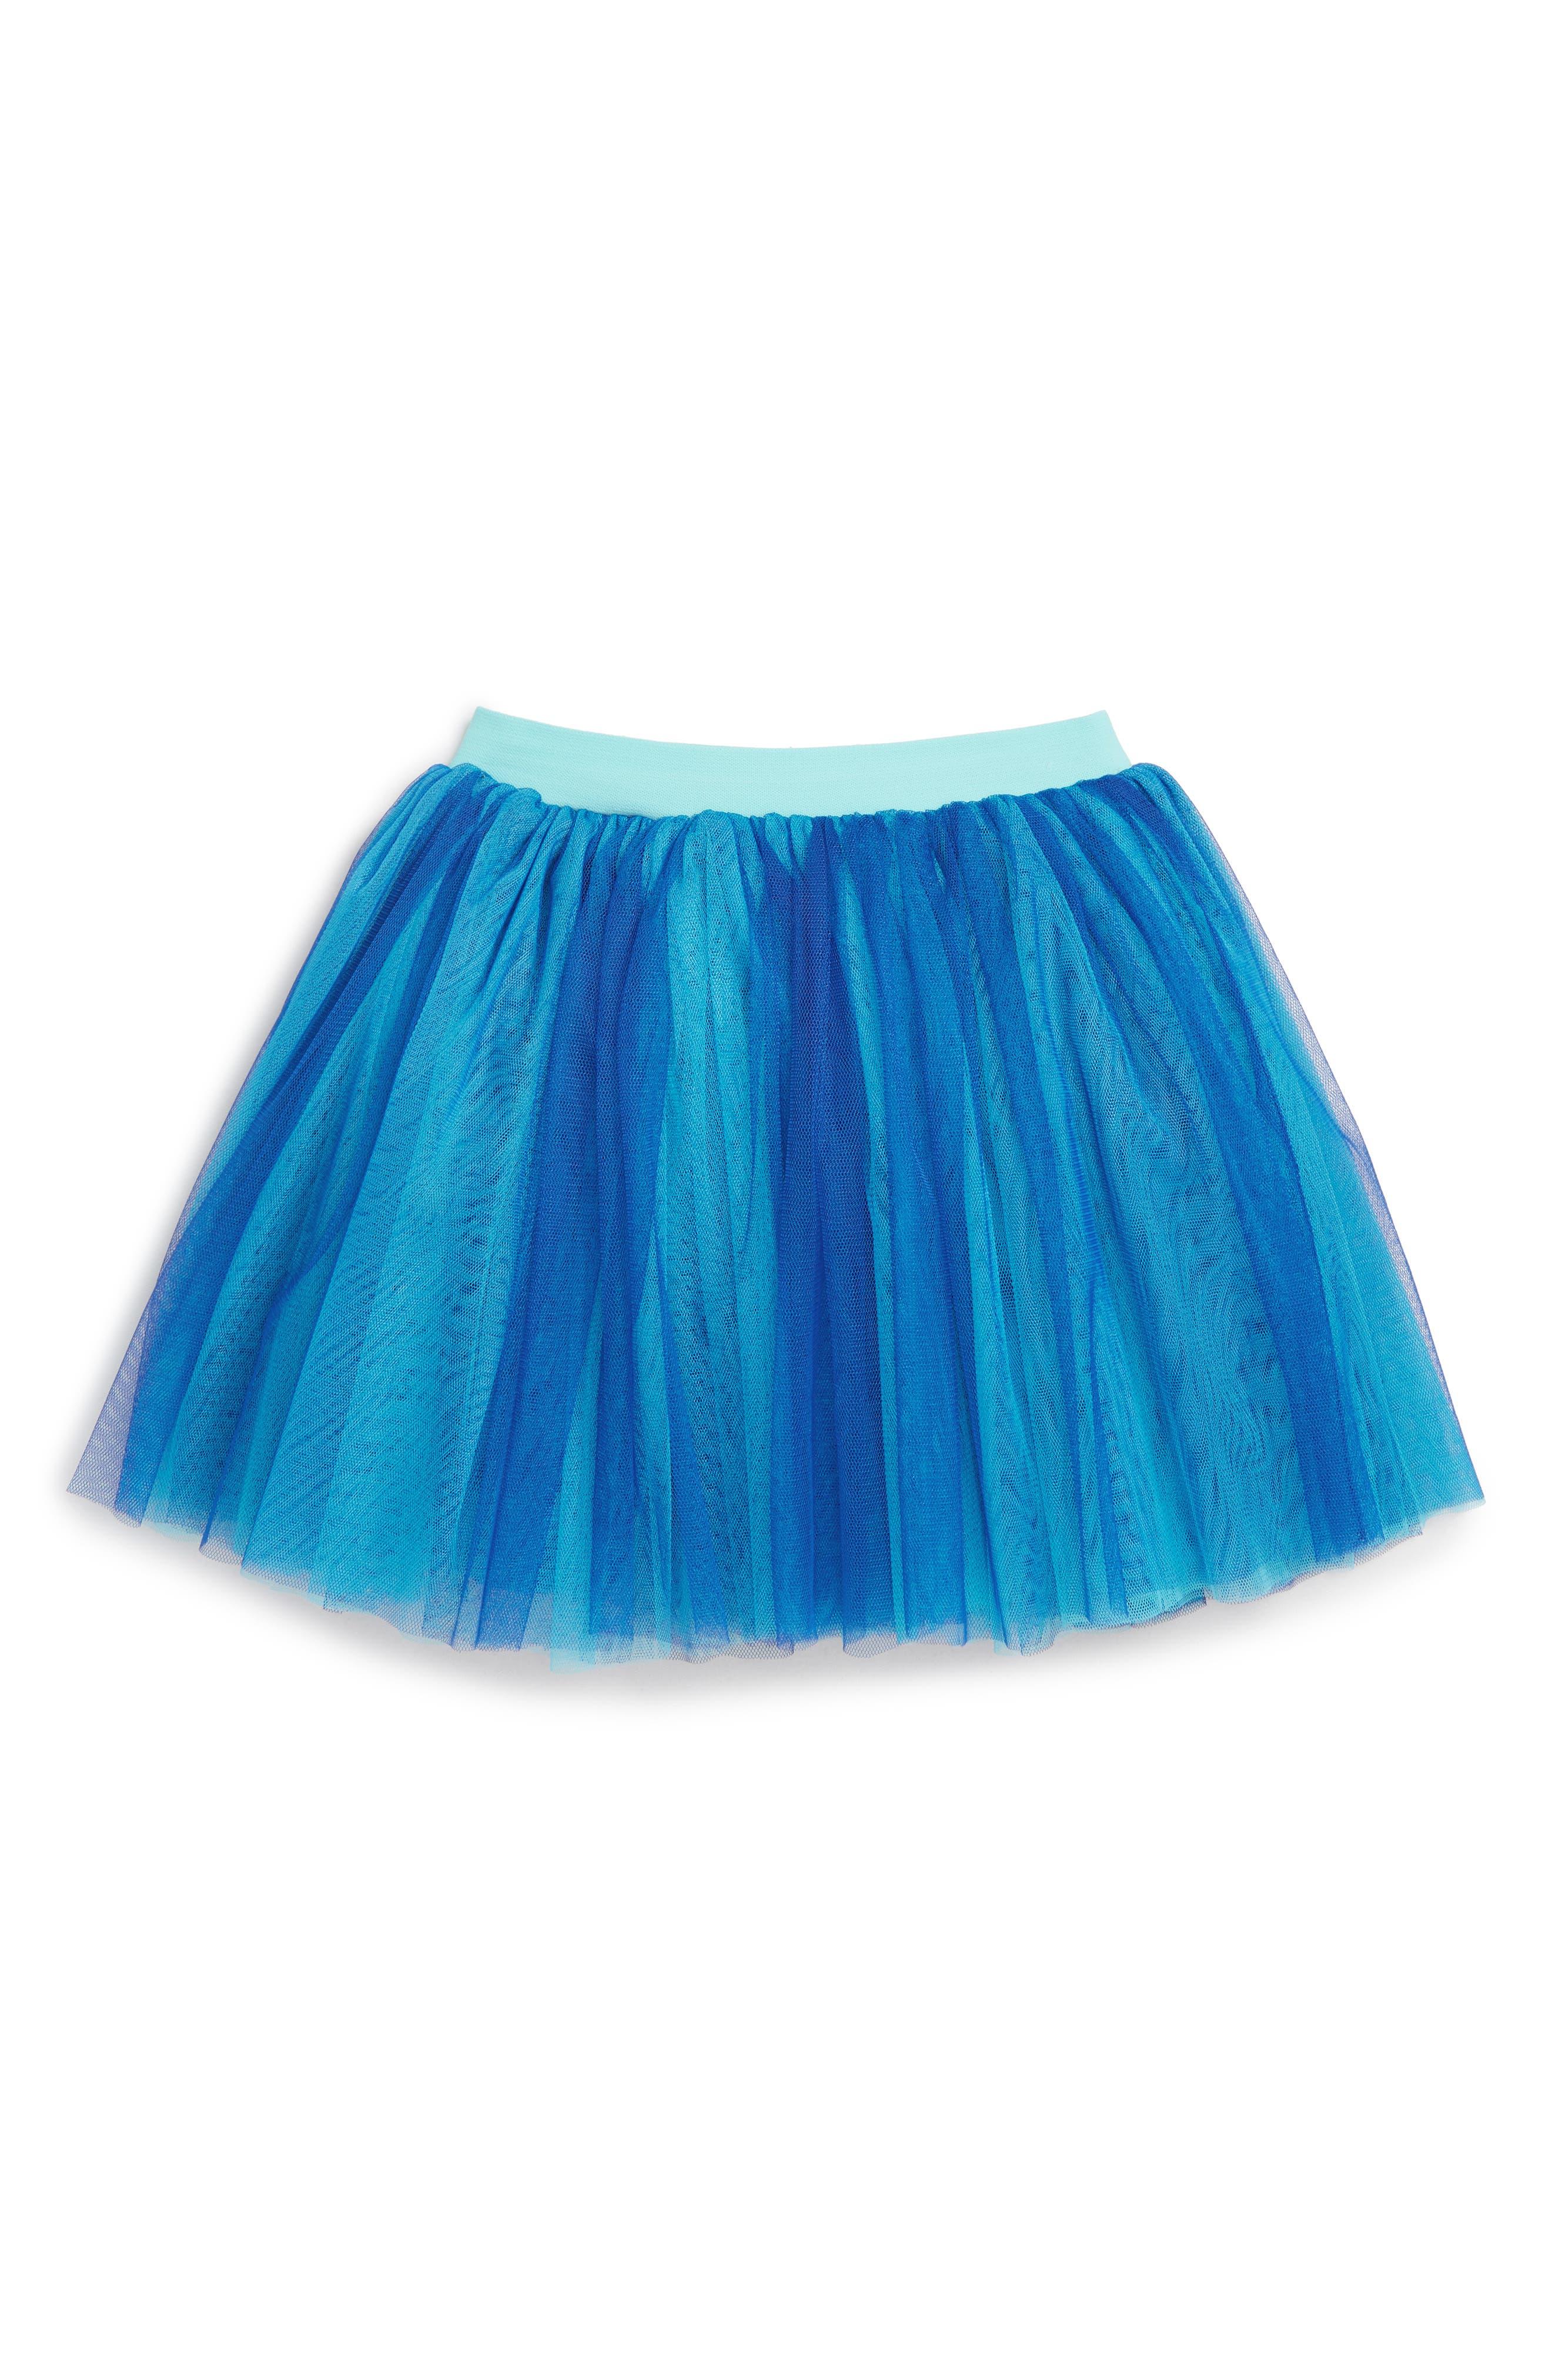 Tutu Skirt,                         Main,                         color, 460